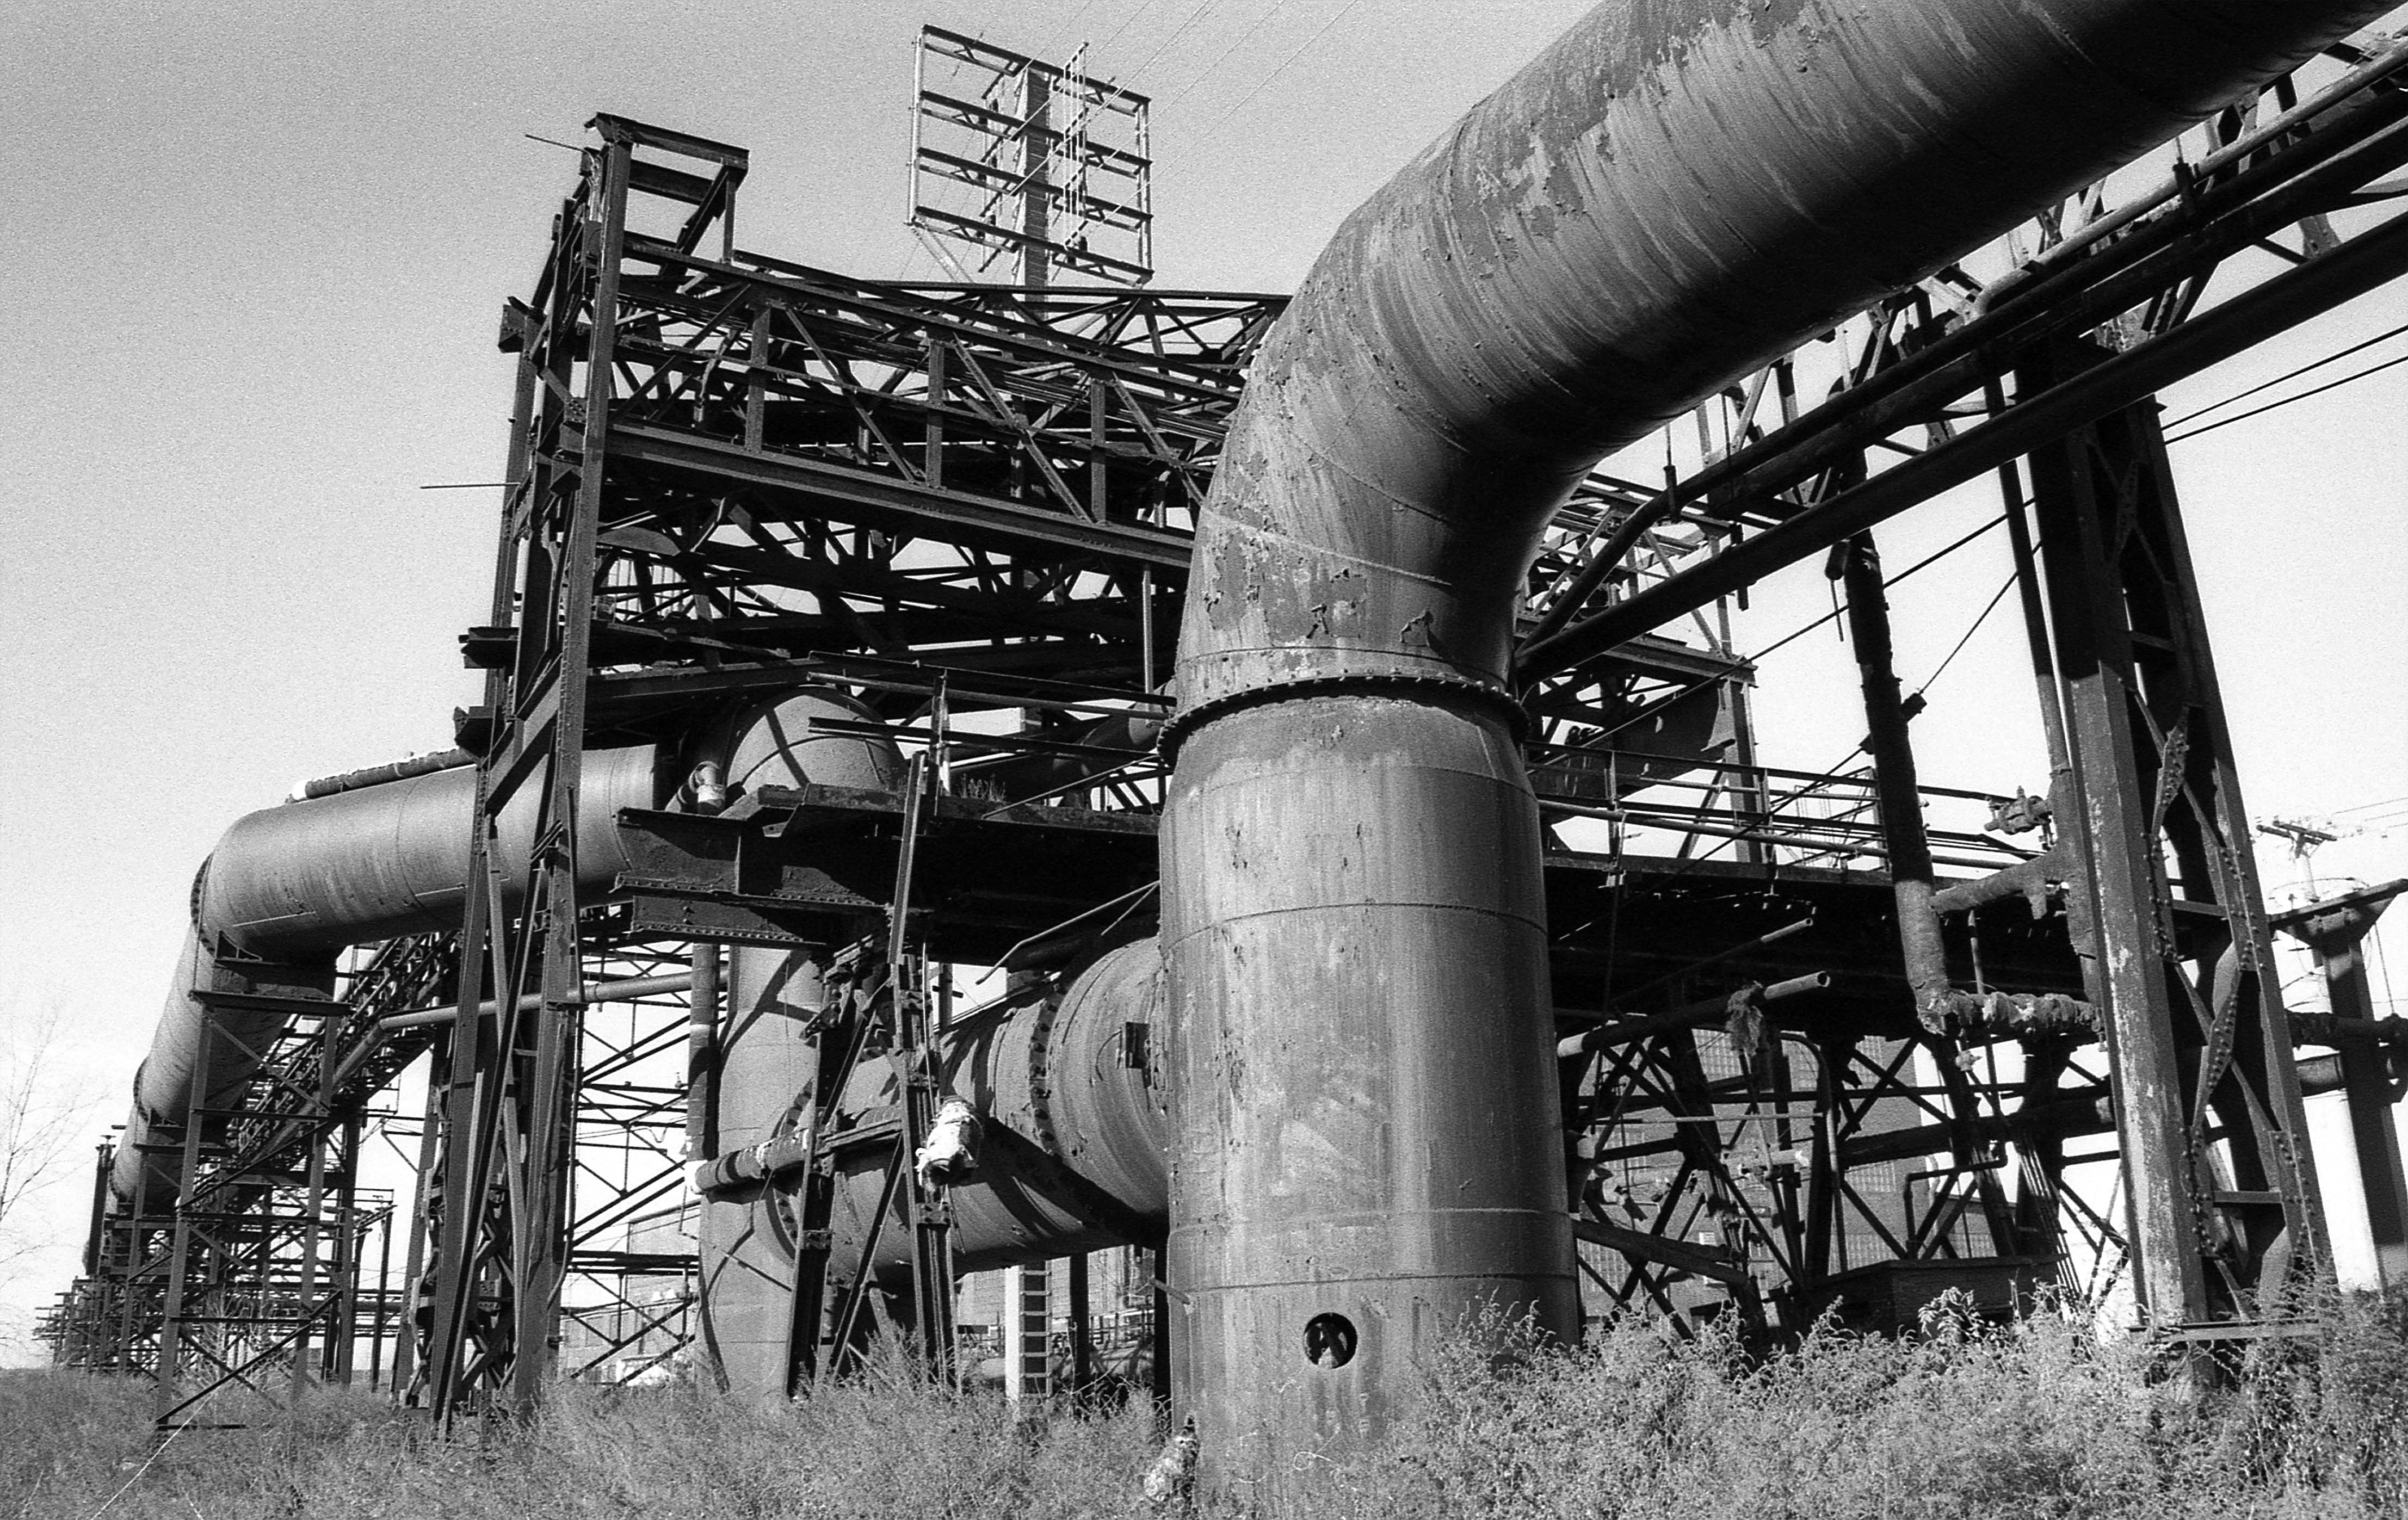 Bethlehem Steel Pipes - Lackawanna, New York - 2010